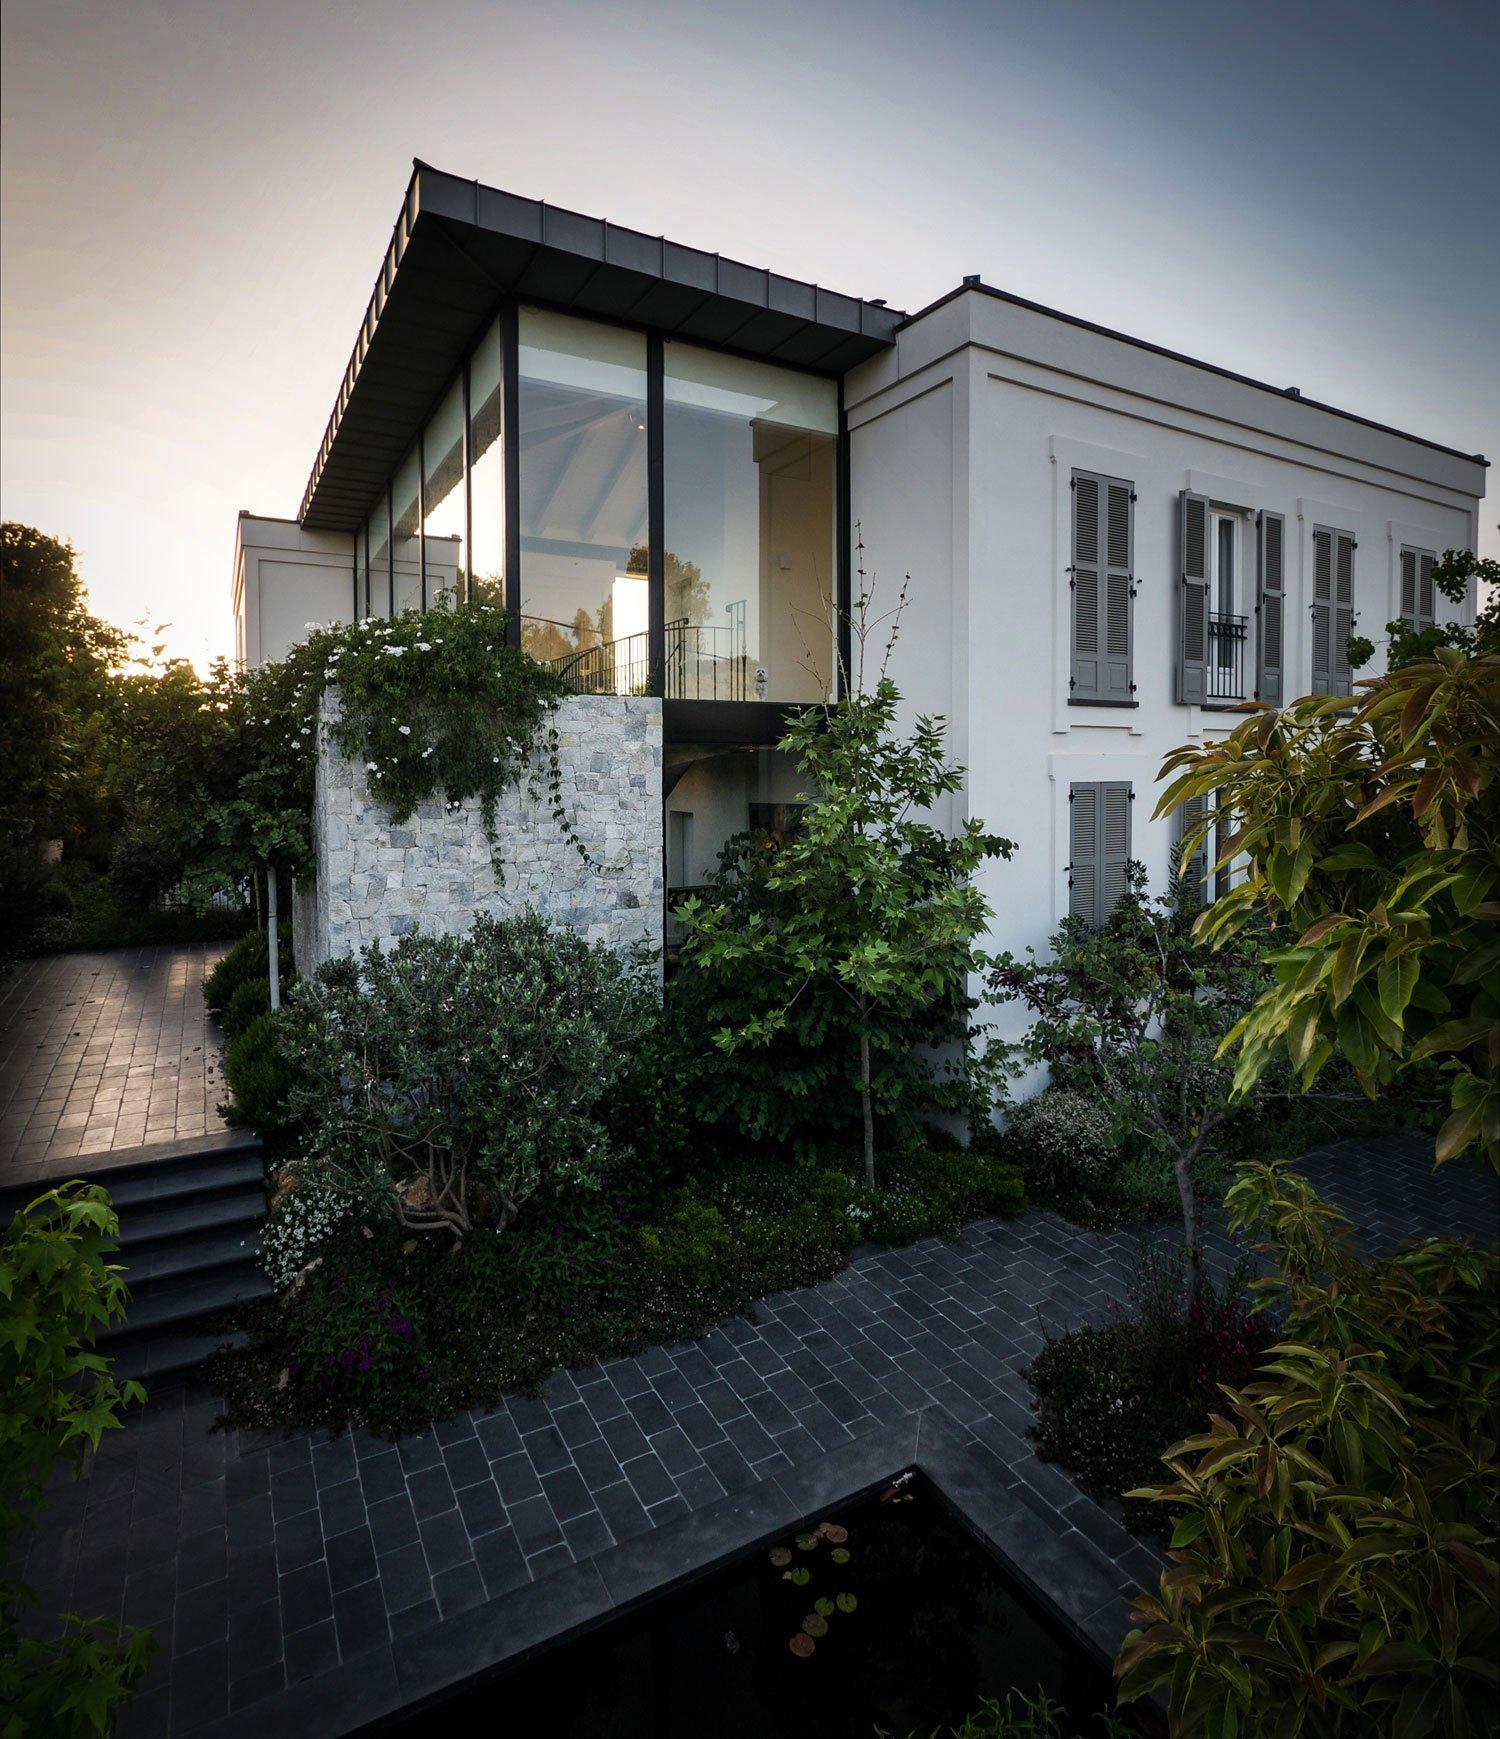 Home-in-Herzlia-Pituach-03